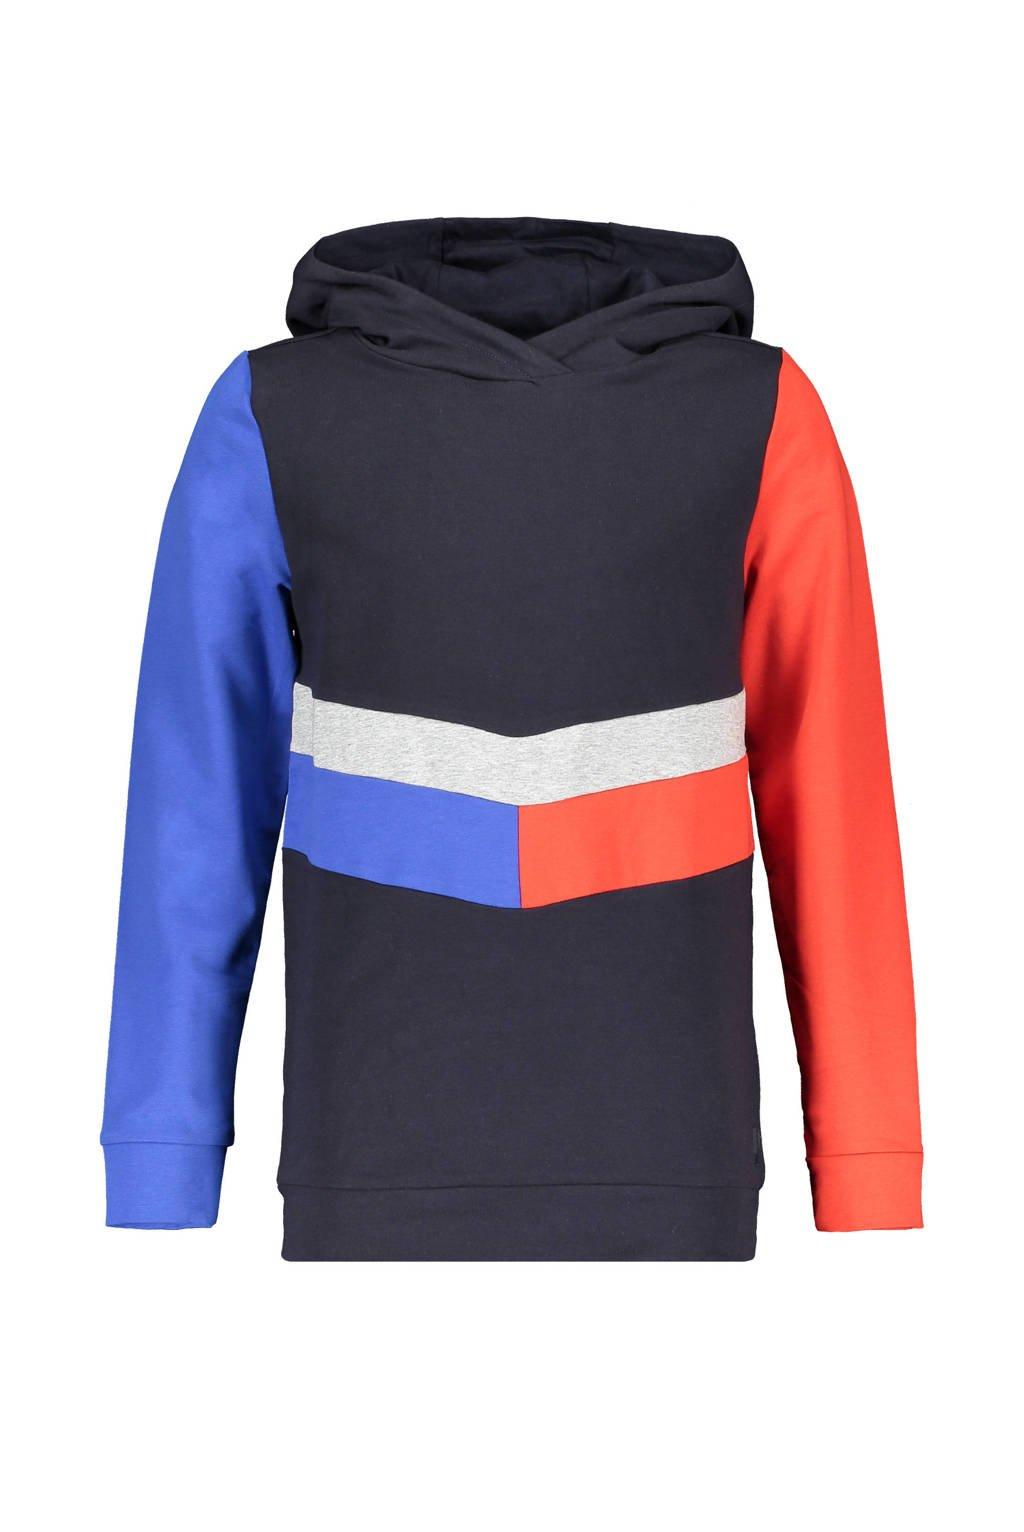 Bellaire hoodie Kako donkerblauw/oranje/wit, Donkerblauw/oranje/wit